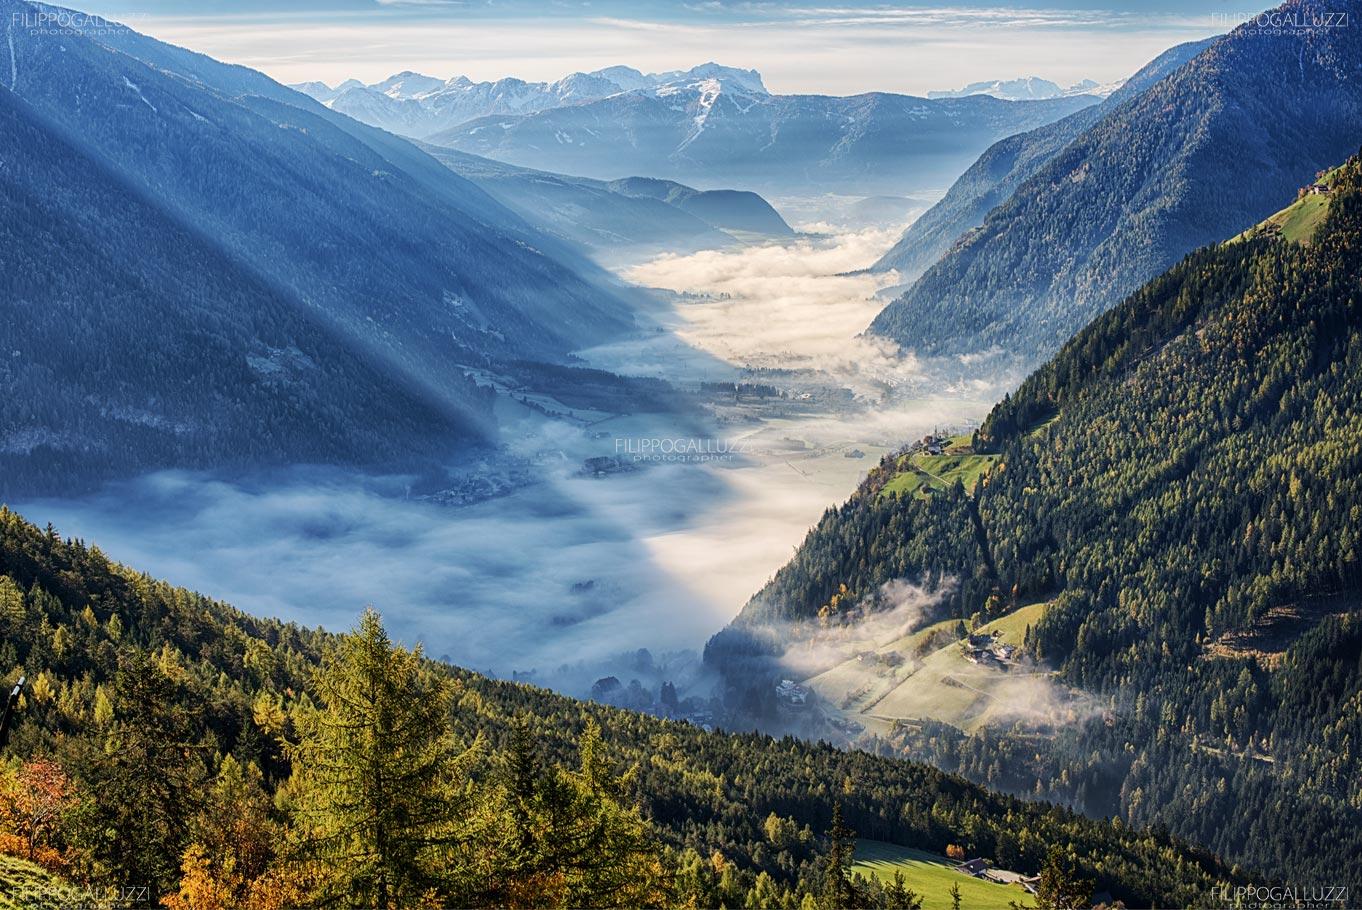 Nebbie mattutina aautunnali sulla Valli di Tures e Aurina, Alto Adige